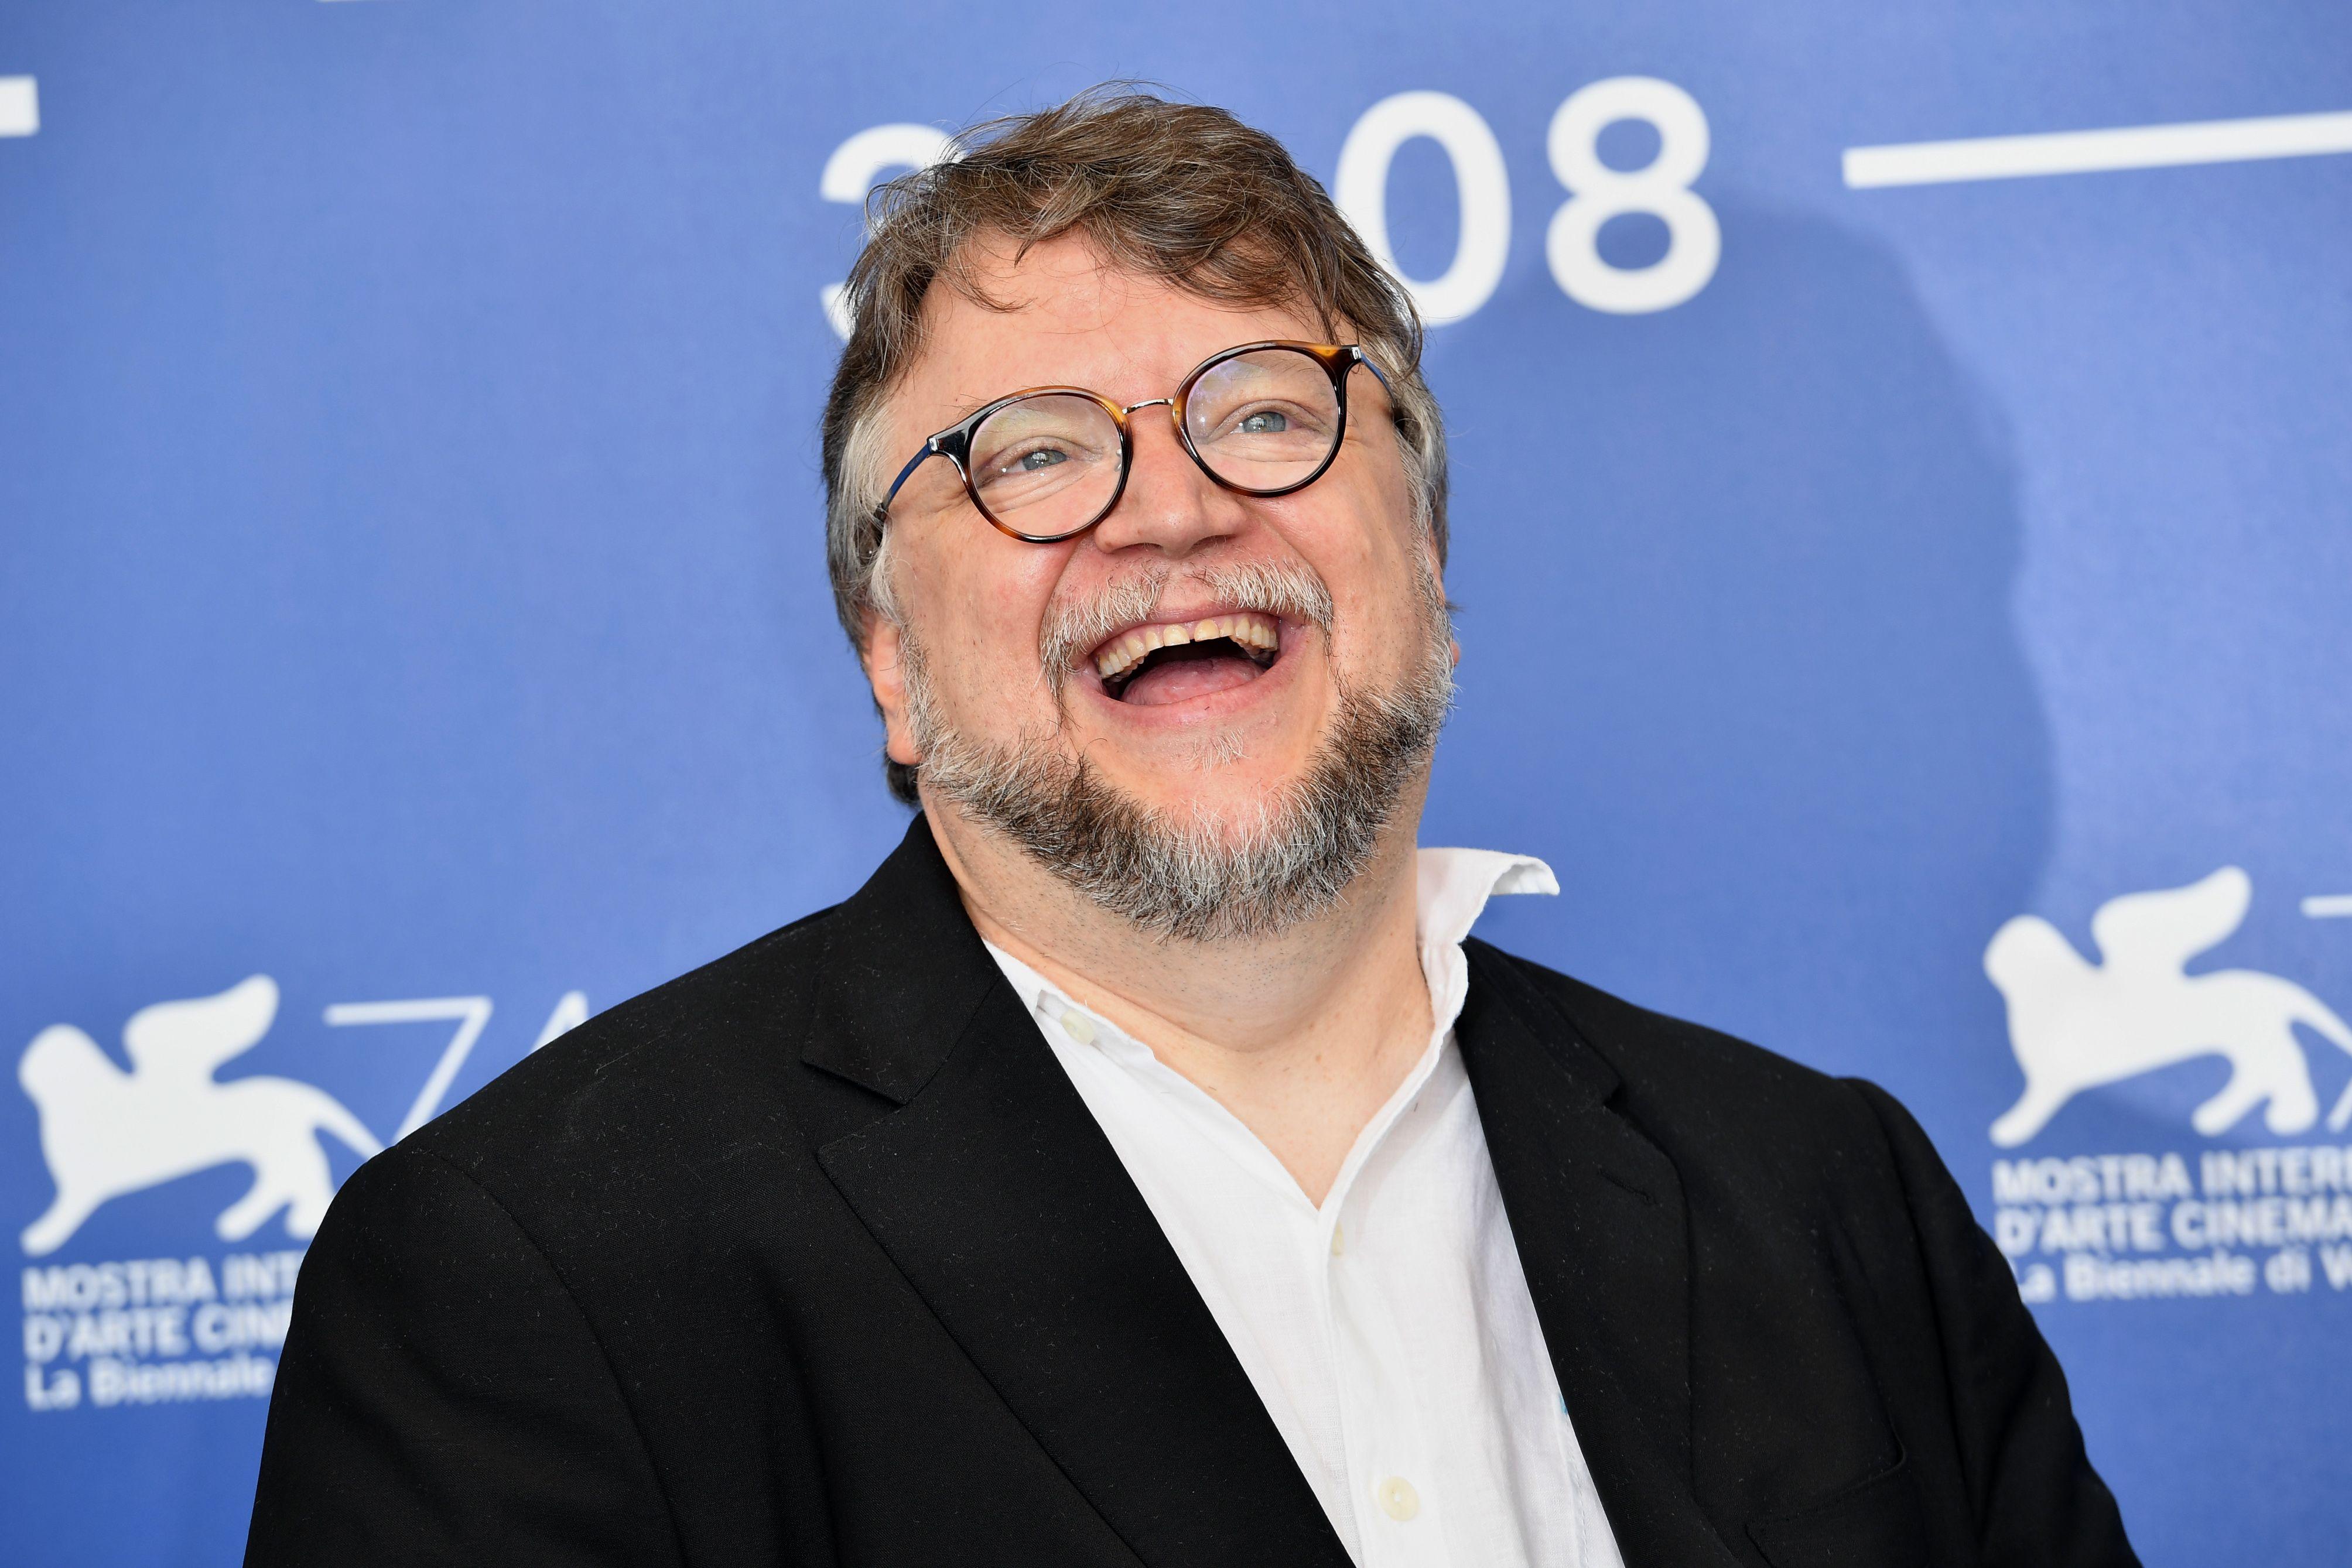 Guillermo del Toro's 'Pinocchio' Needs $35 Million to Start